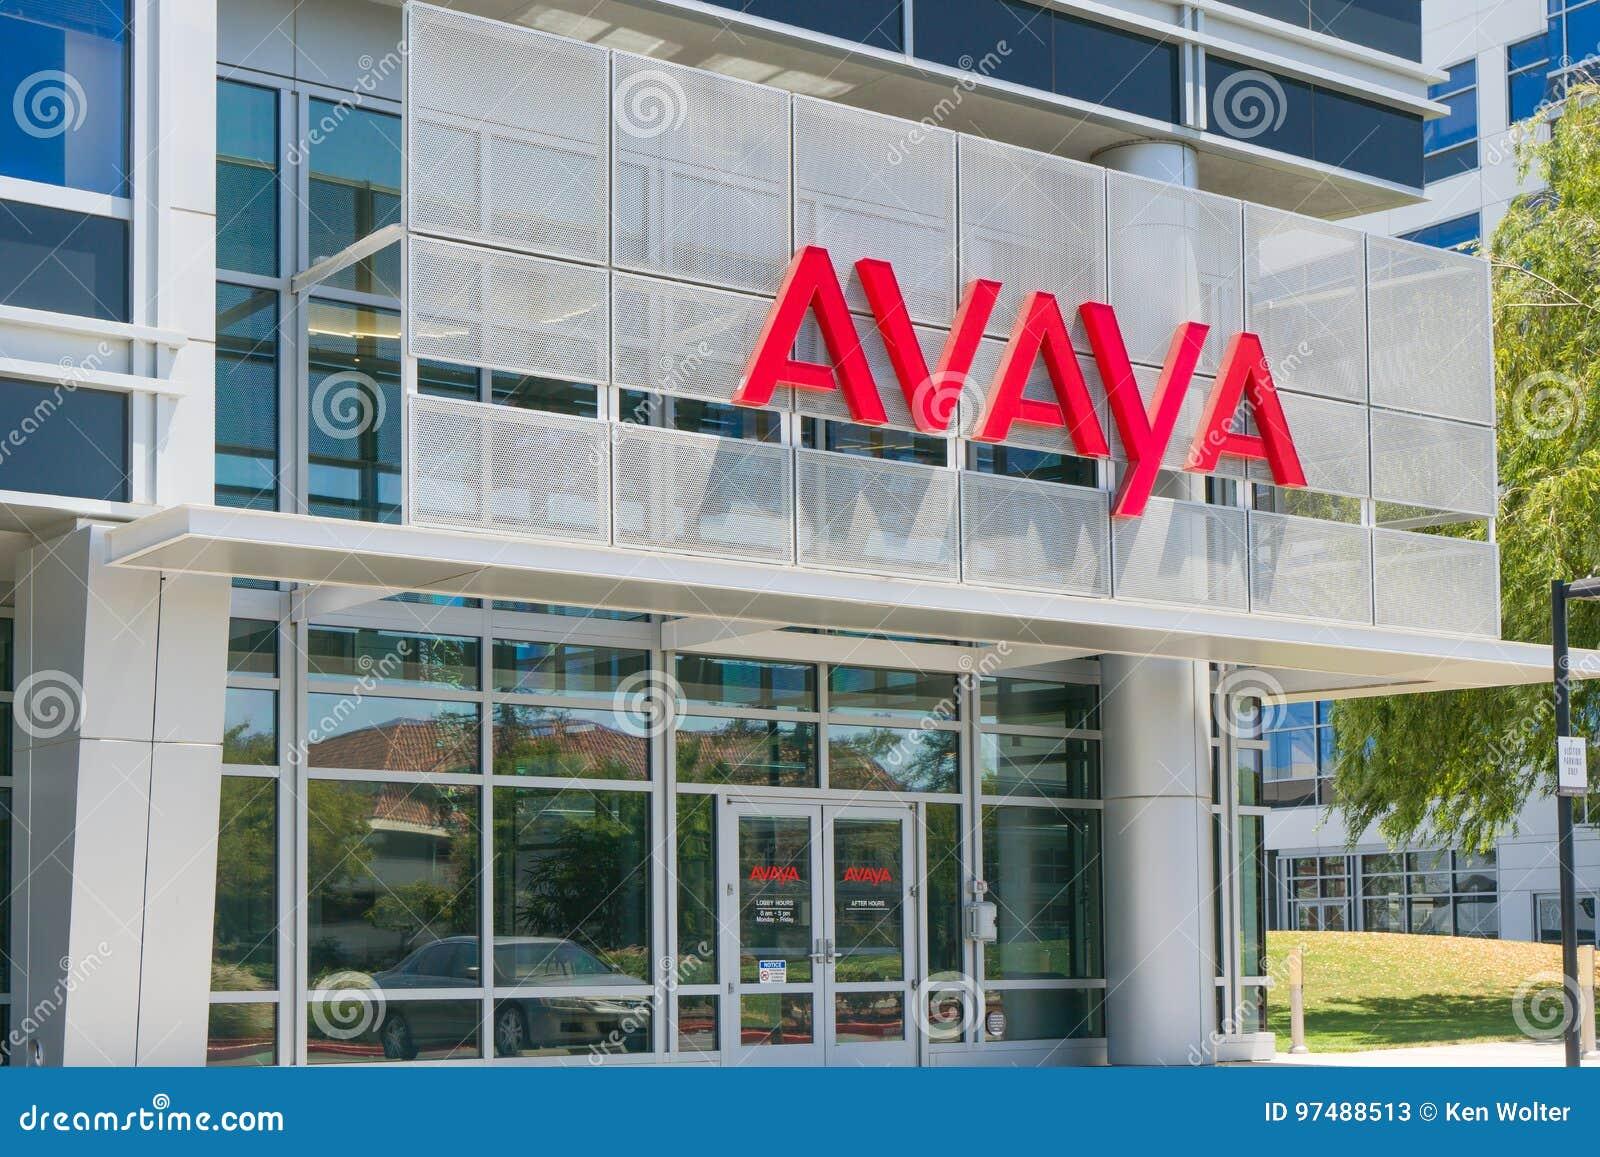 Avaya Corporate Headquarters Building